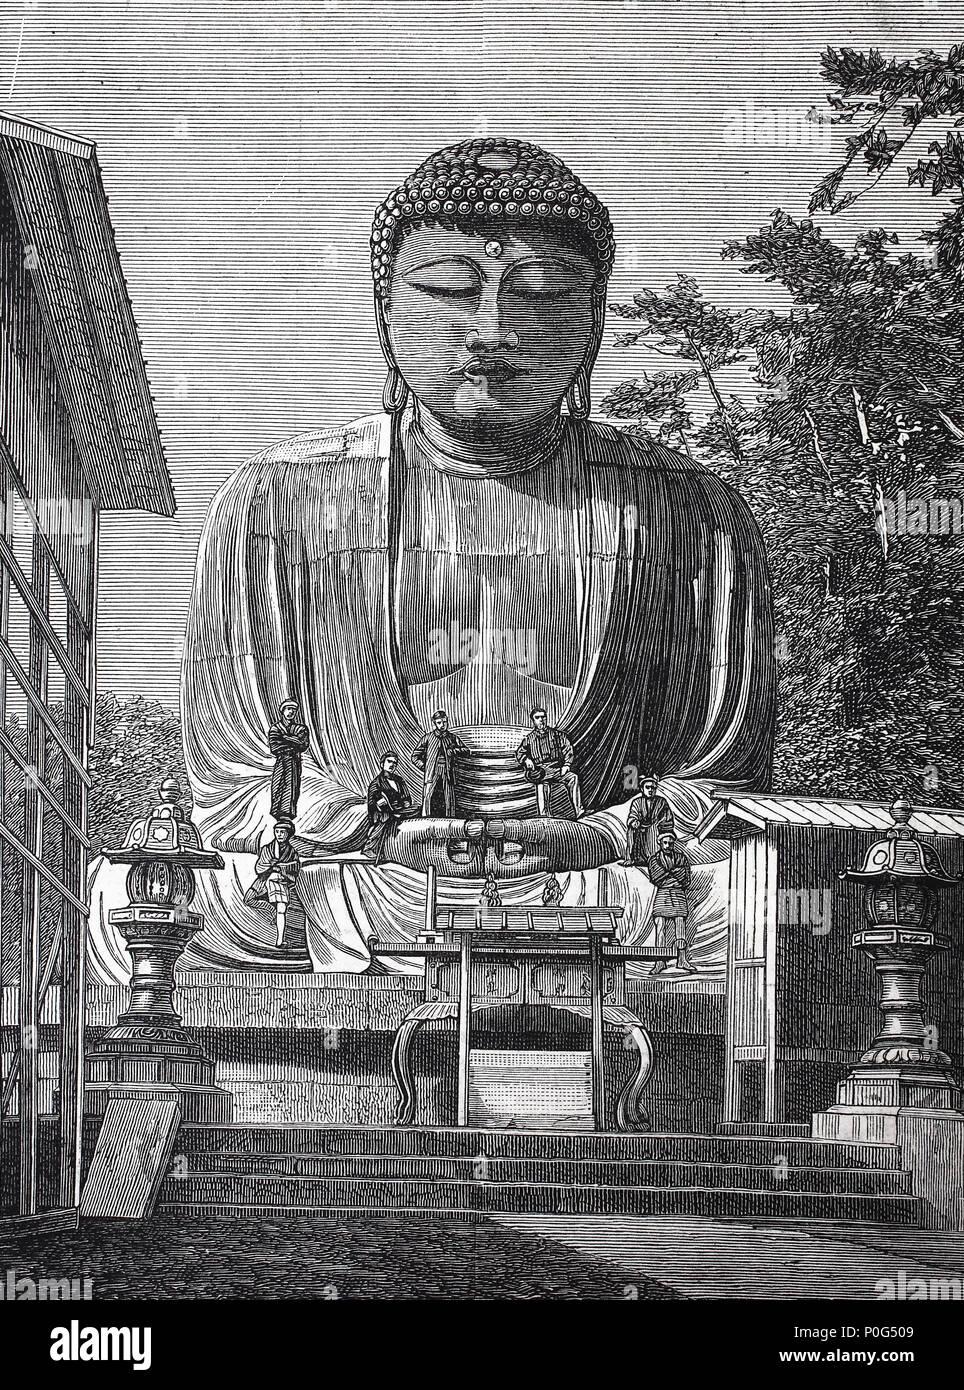 Daibutsu at Kamakura - Colossal Statue of Buddha, Japan, digital improved reproduction of an original print from the year 1881 - Stock Image